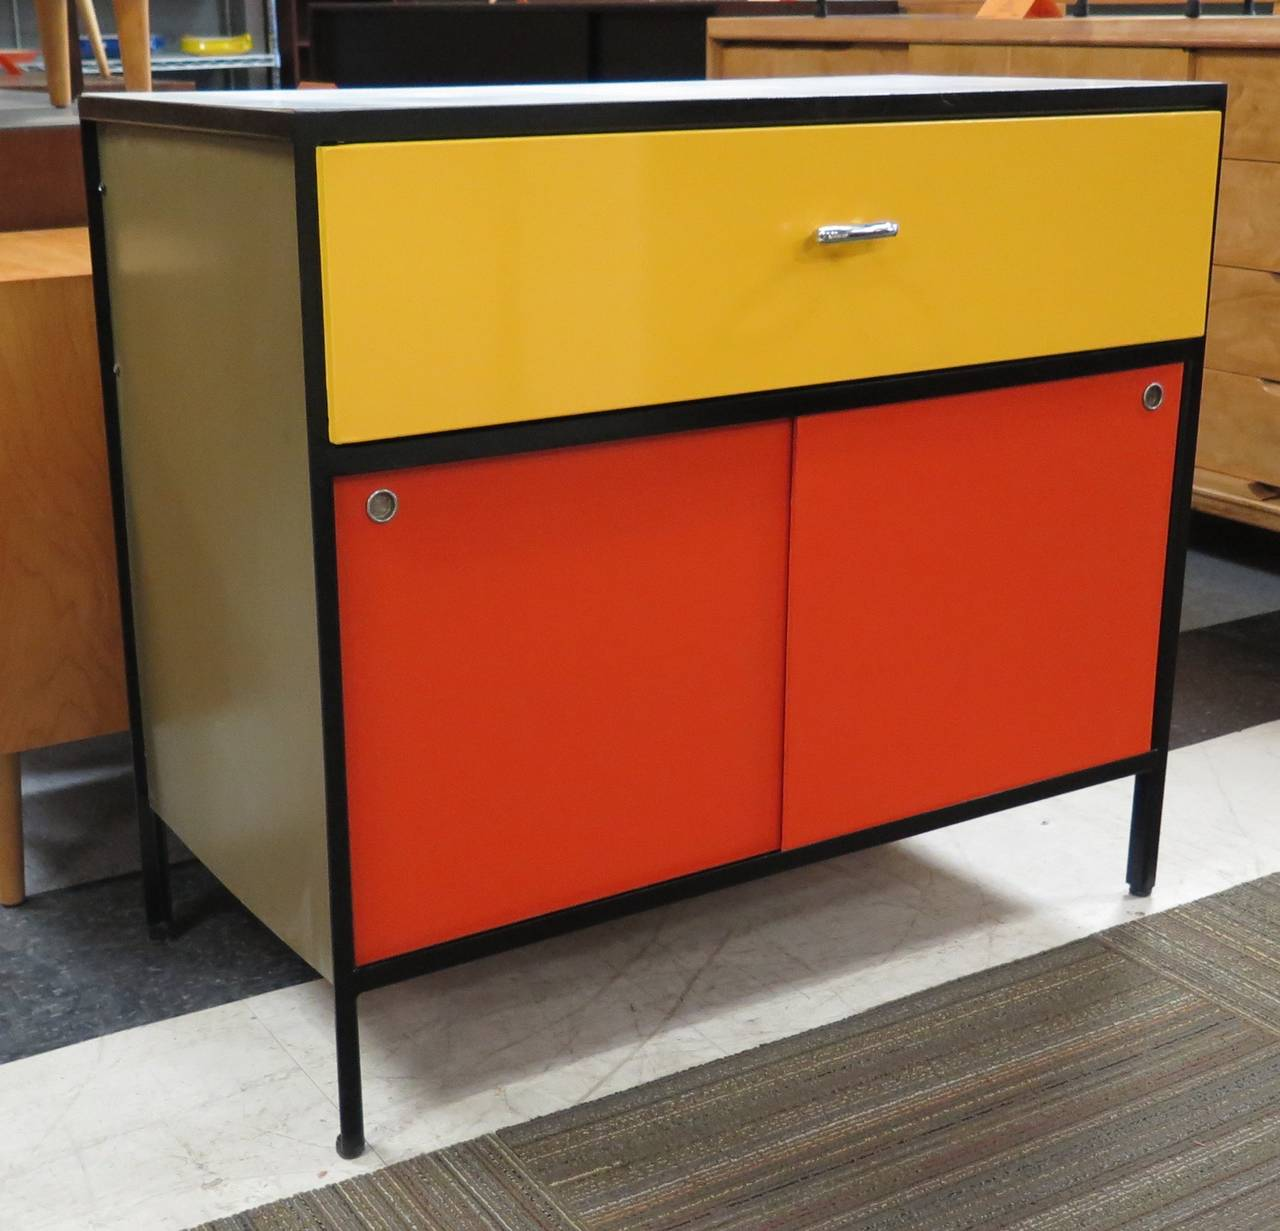 Steel Frame Kitchen Cabinets: Vibrant 1950s George Nelson Steel Frame Cabinet Image 8